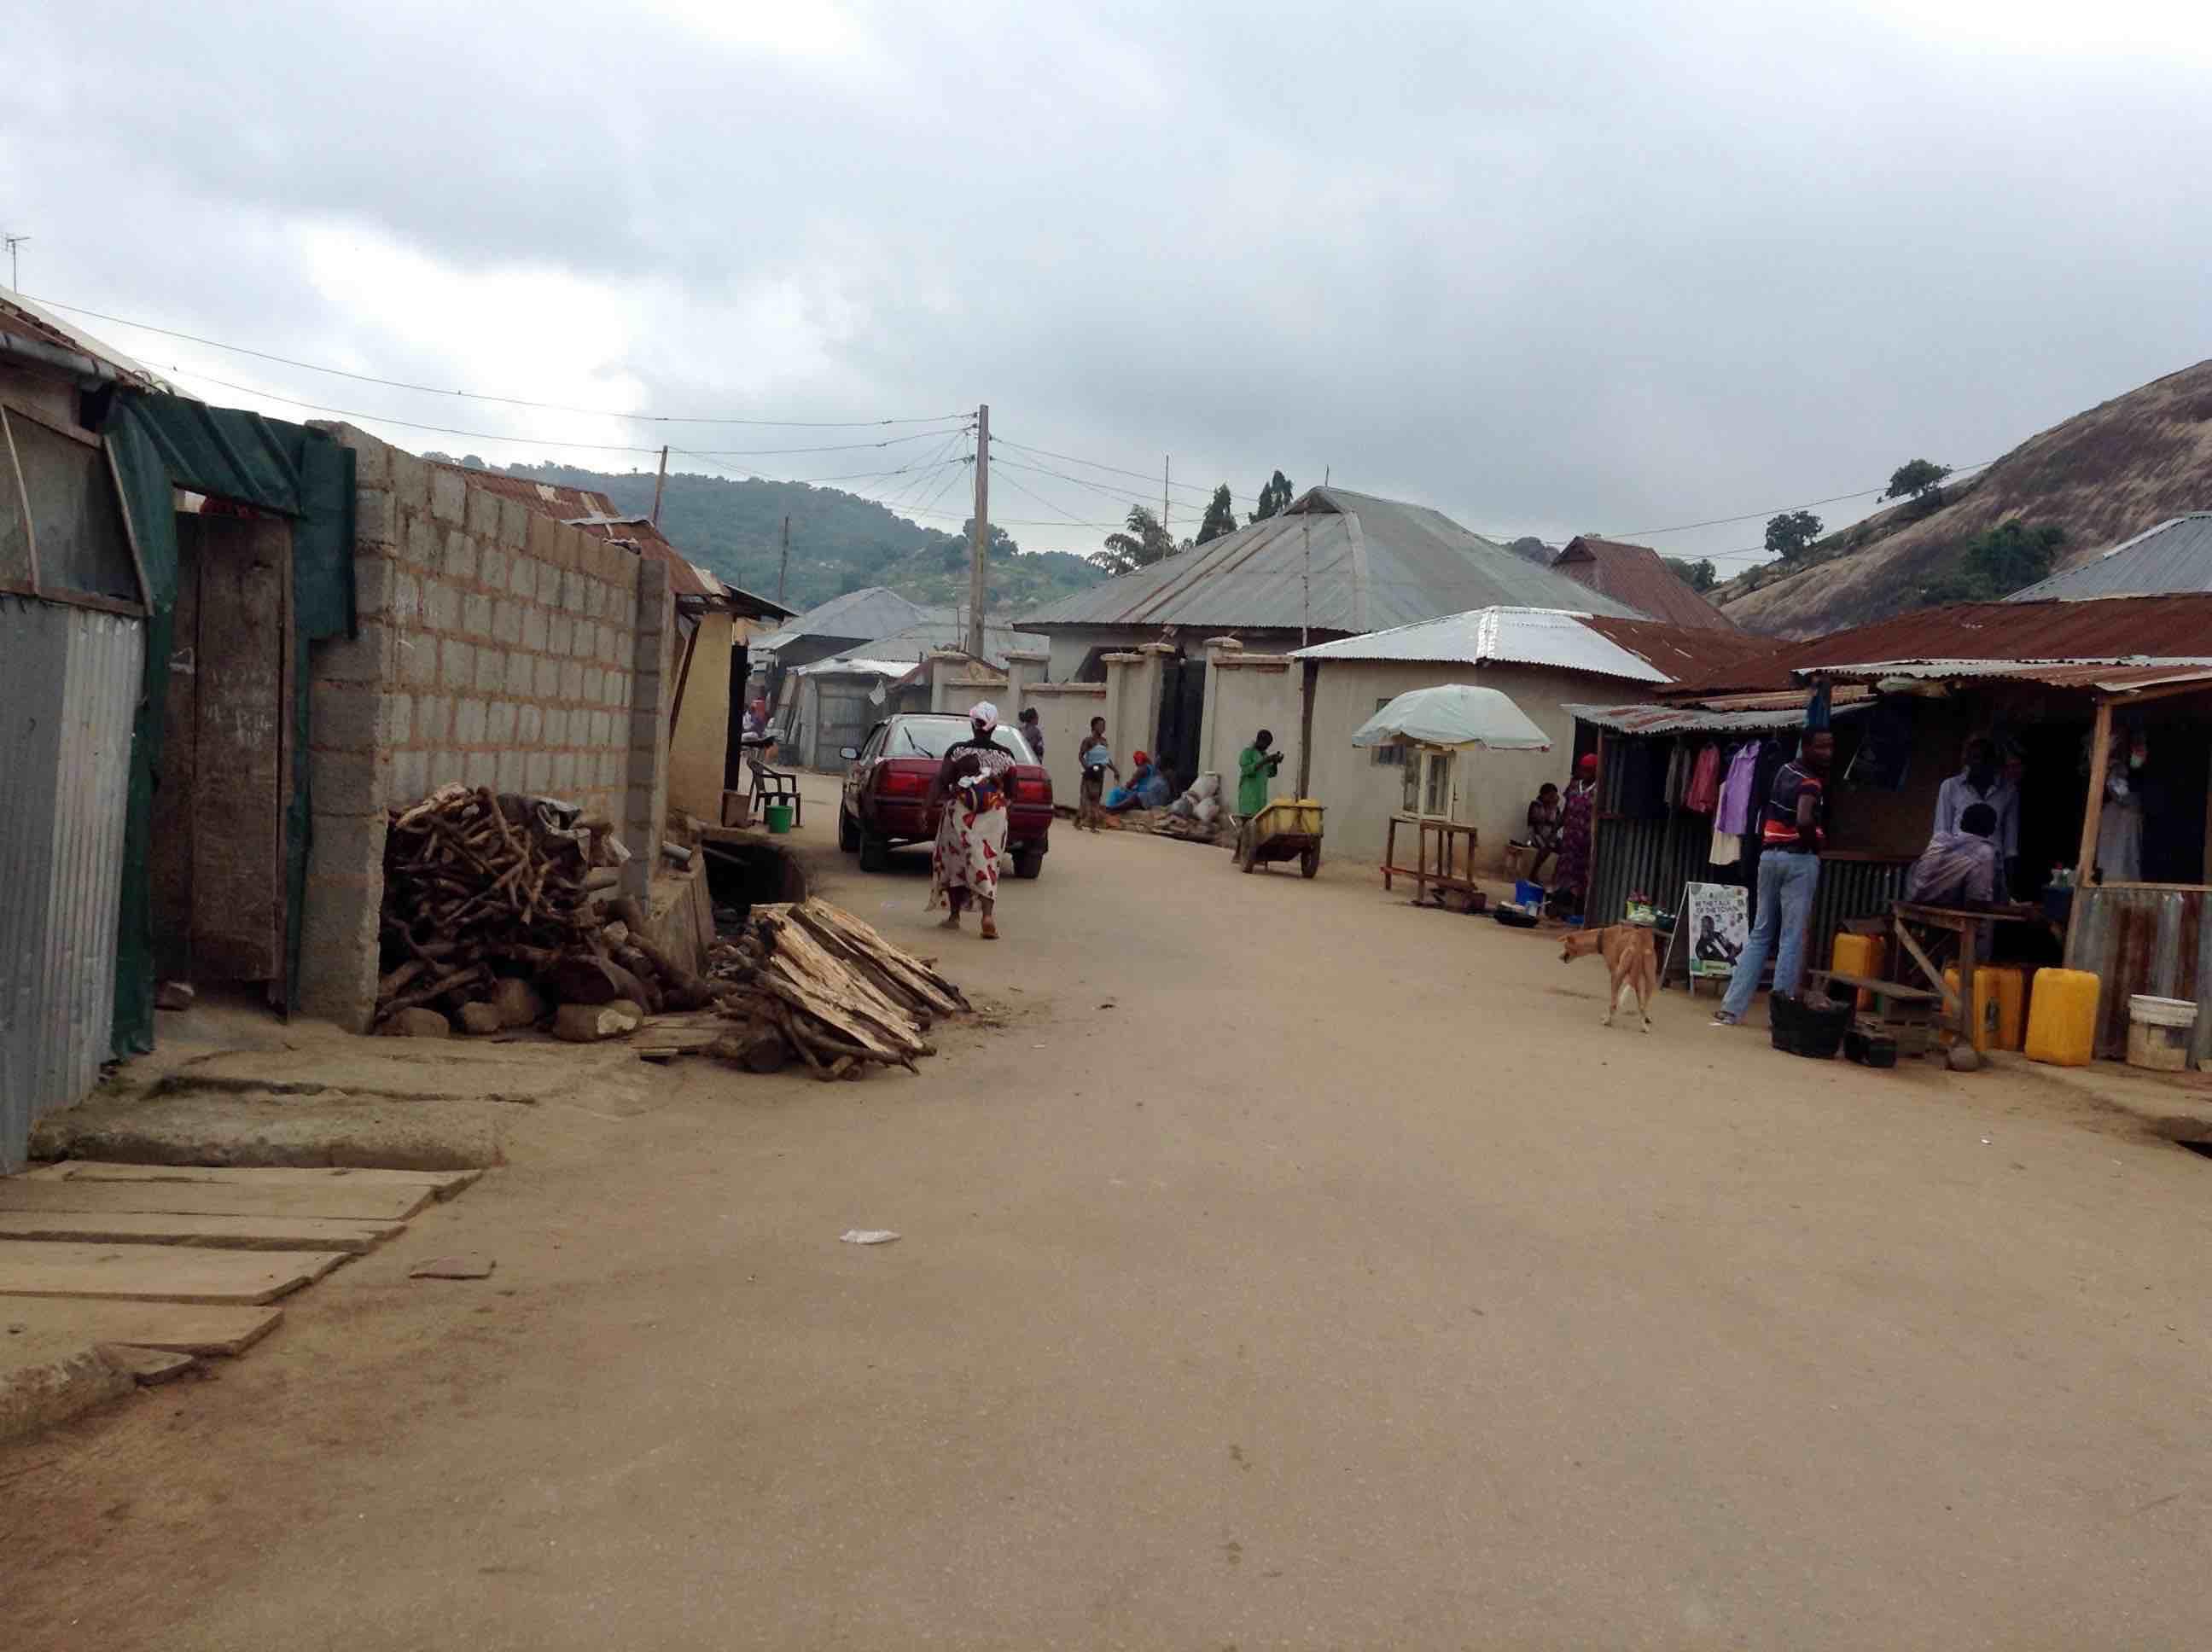 Street scene, Ushafa Village, FCT, Abuja, Nigeria. #JujuFilms